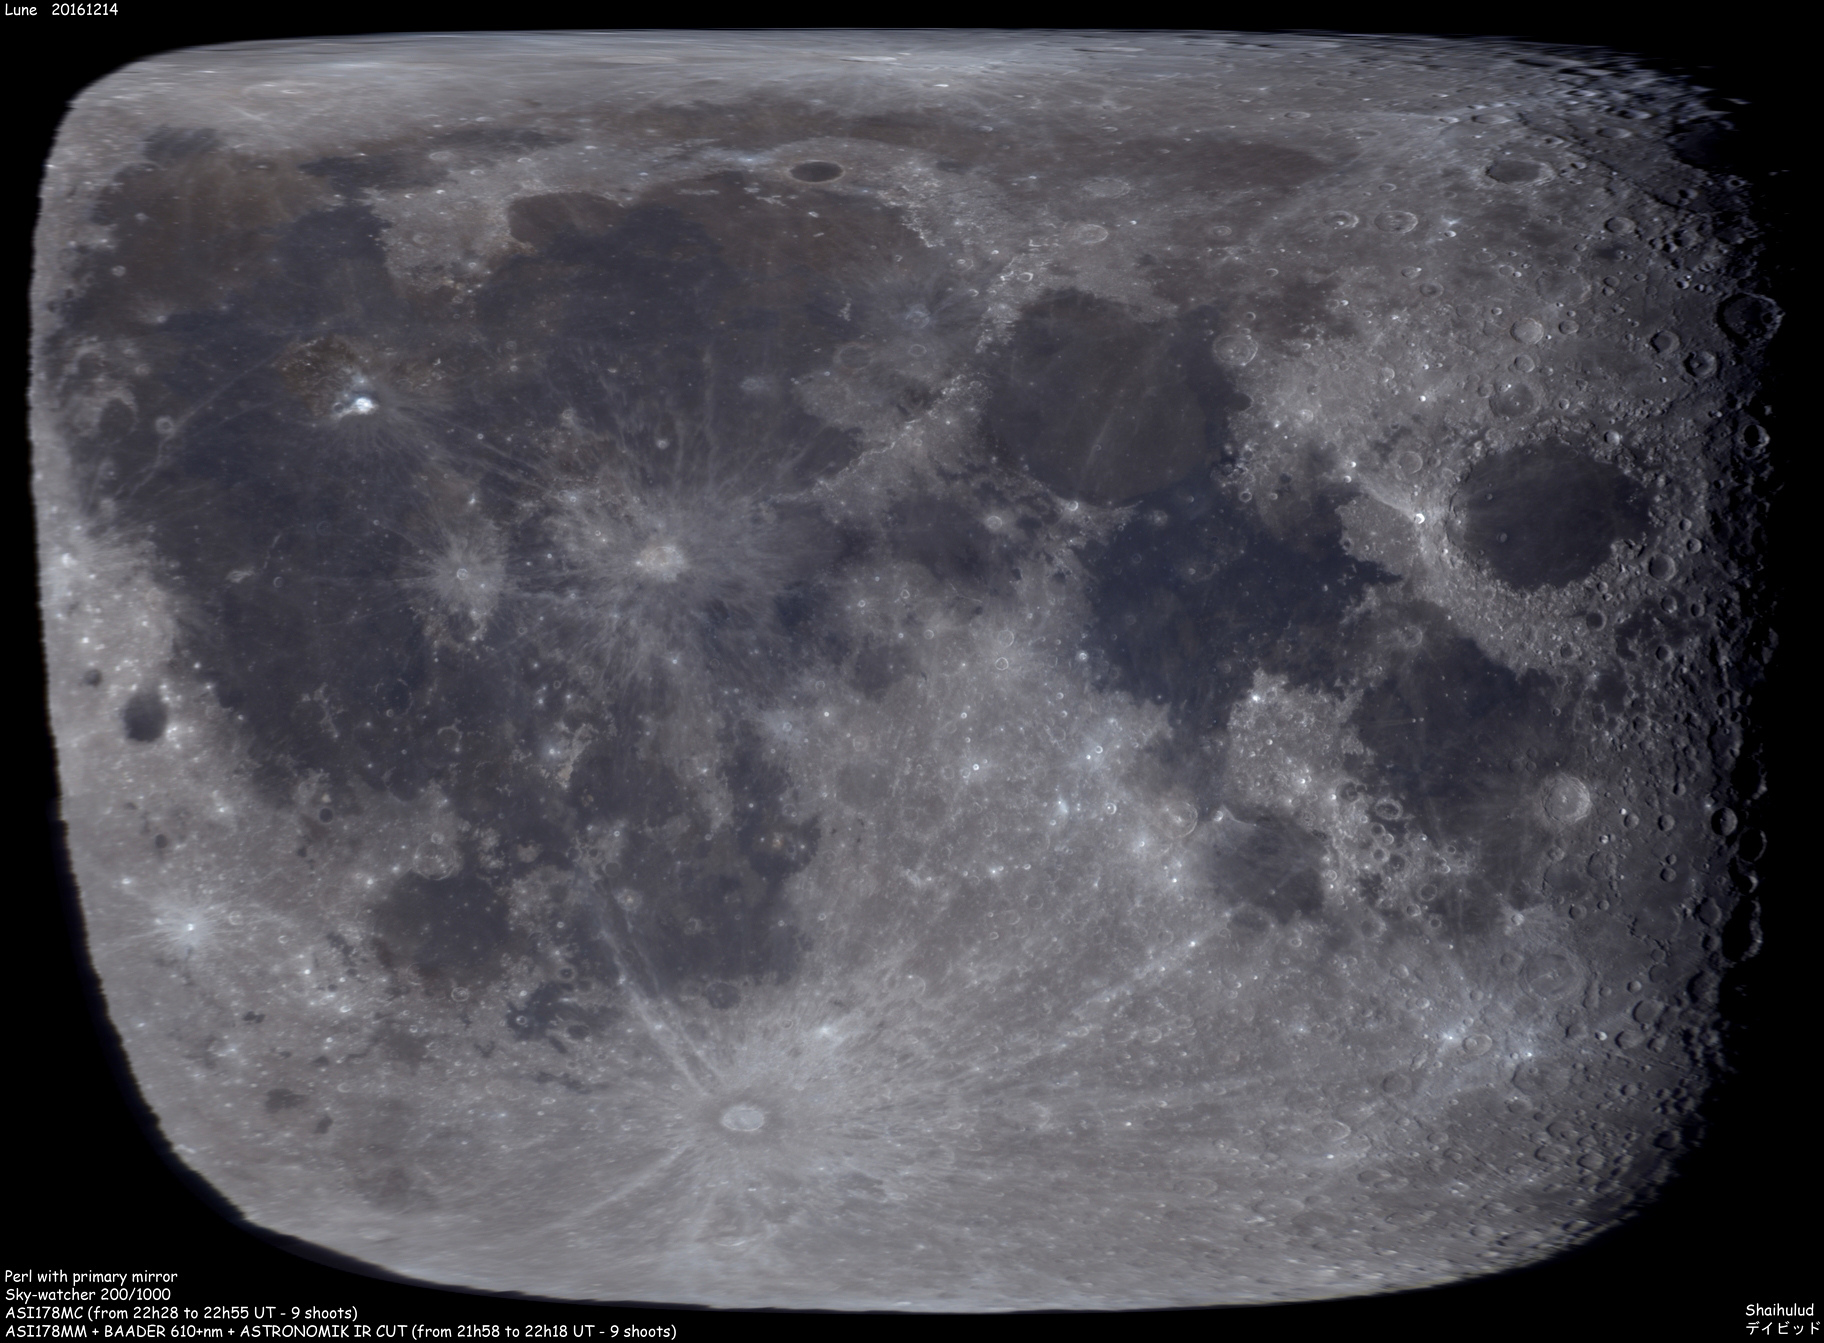 Lune 20161214 (1/3)